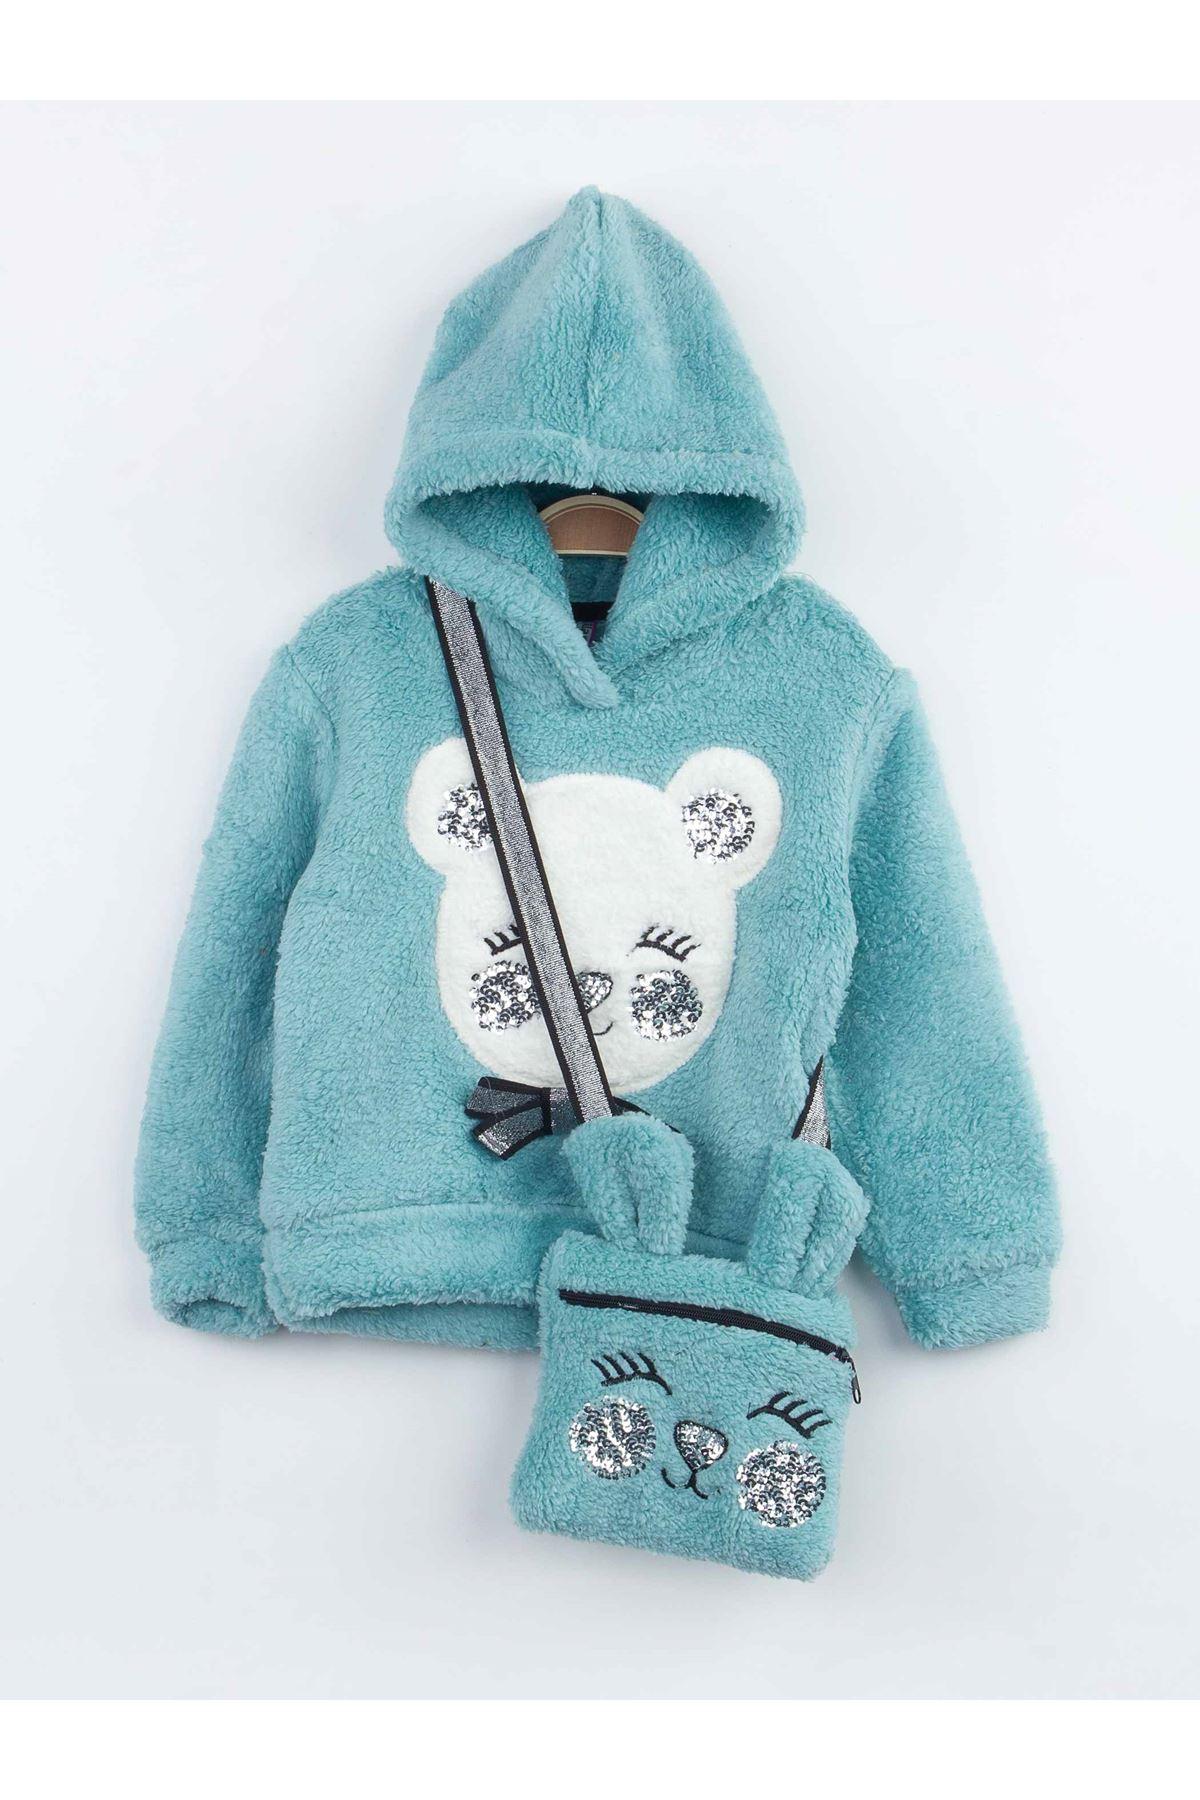 Green Winter Plush Female Child Bag 3 PCs Set